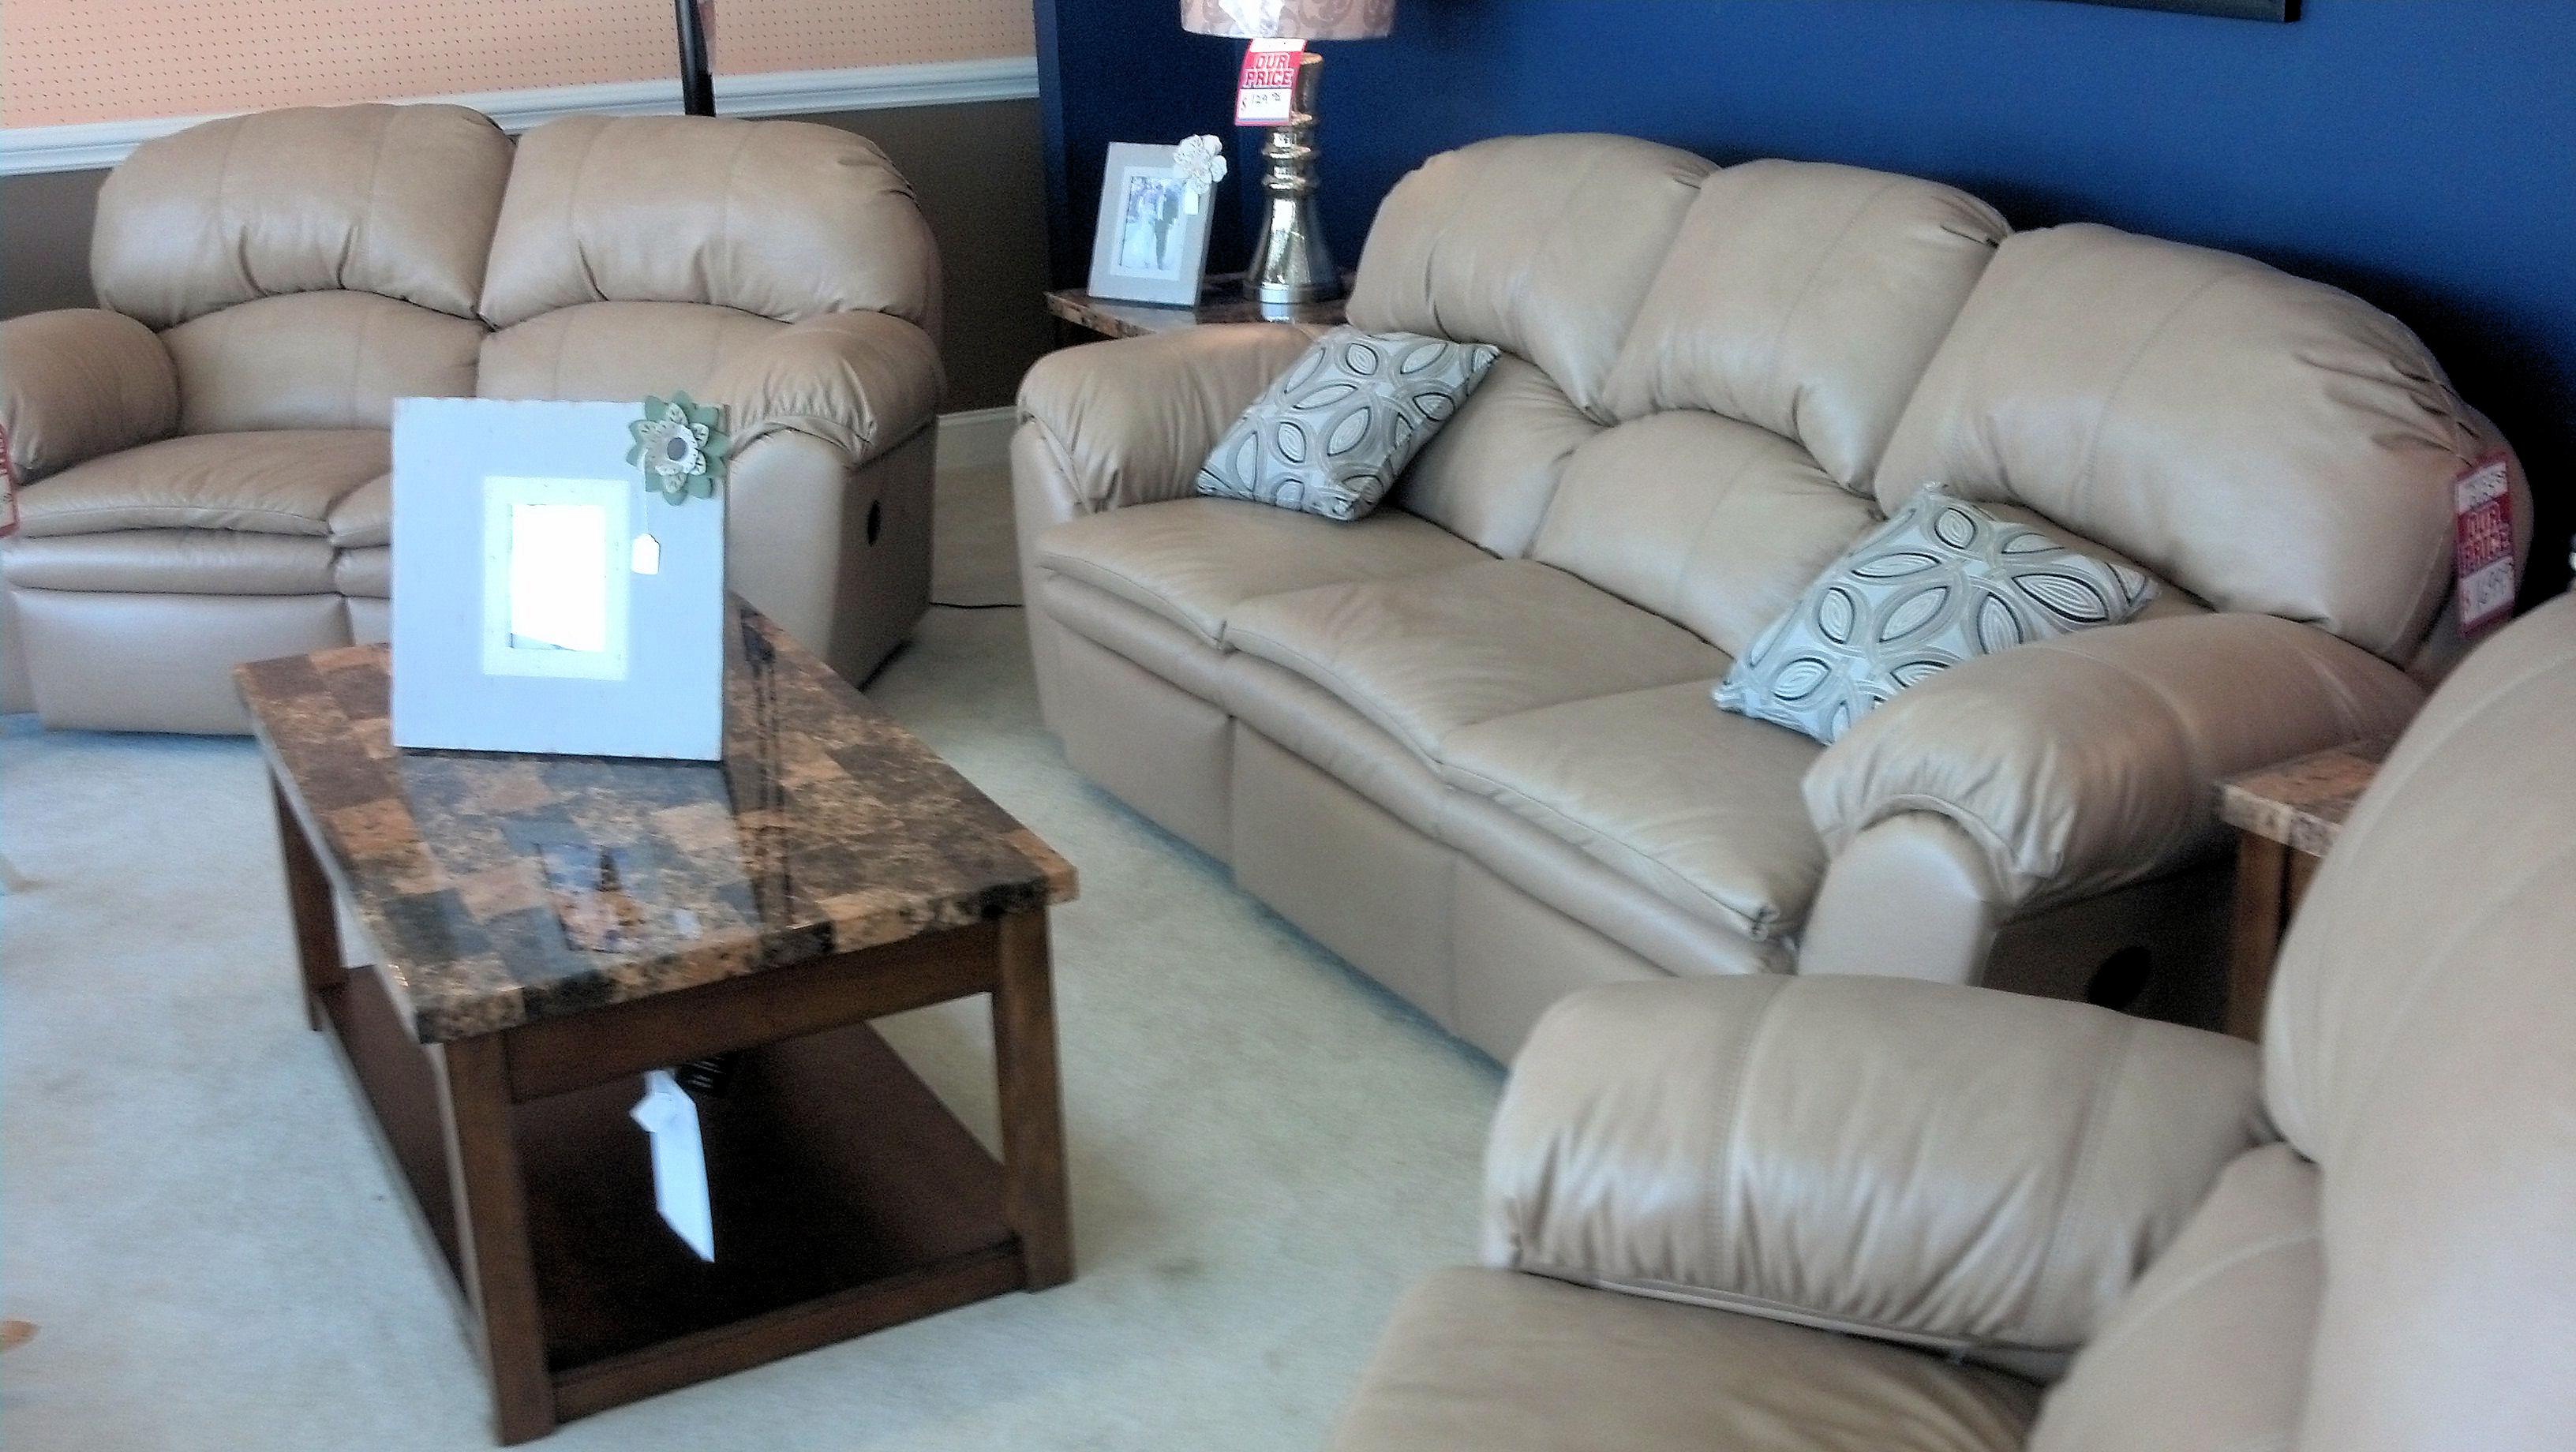 Attrayant Fredericku0027s Furniture, Flooring U0026 Appliances